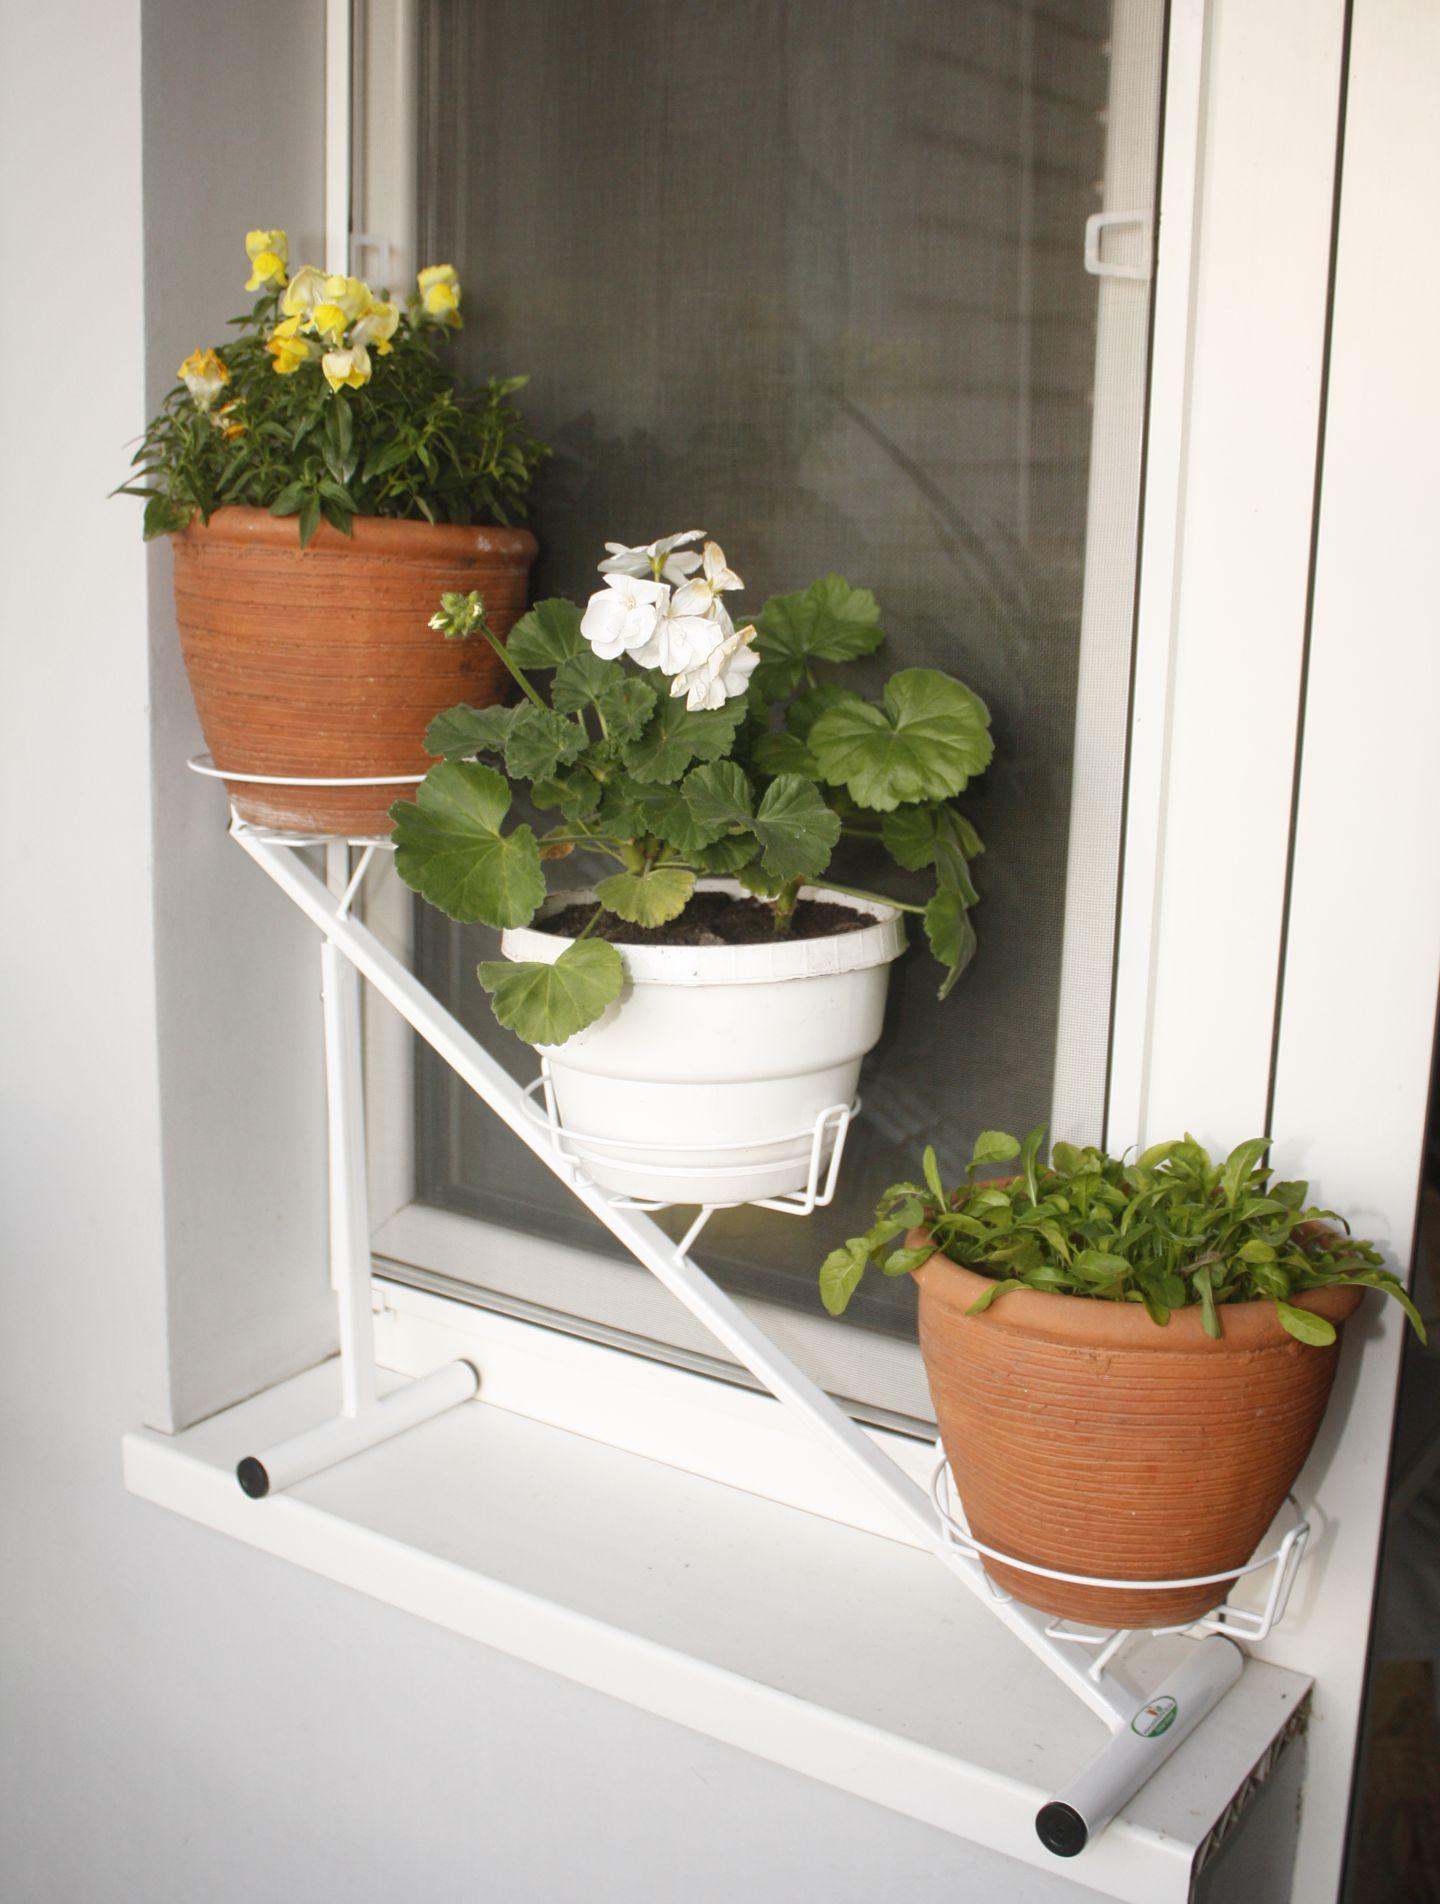 Подставки для цветов на подоконник Условия для выращивания цветов на окне 49